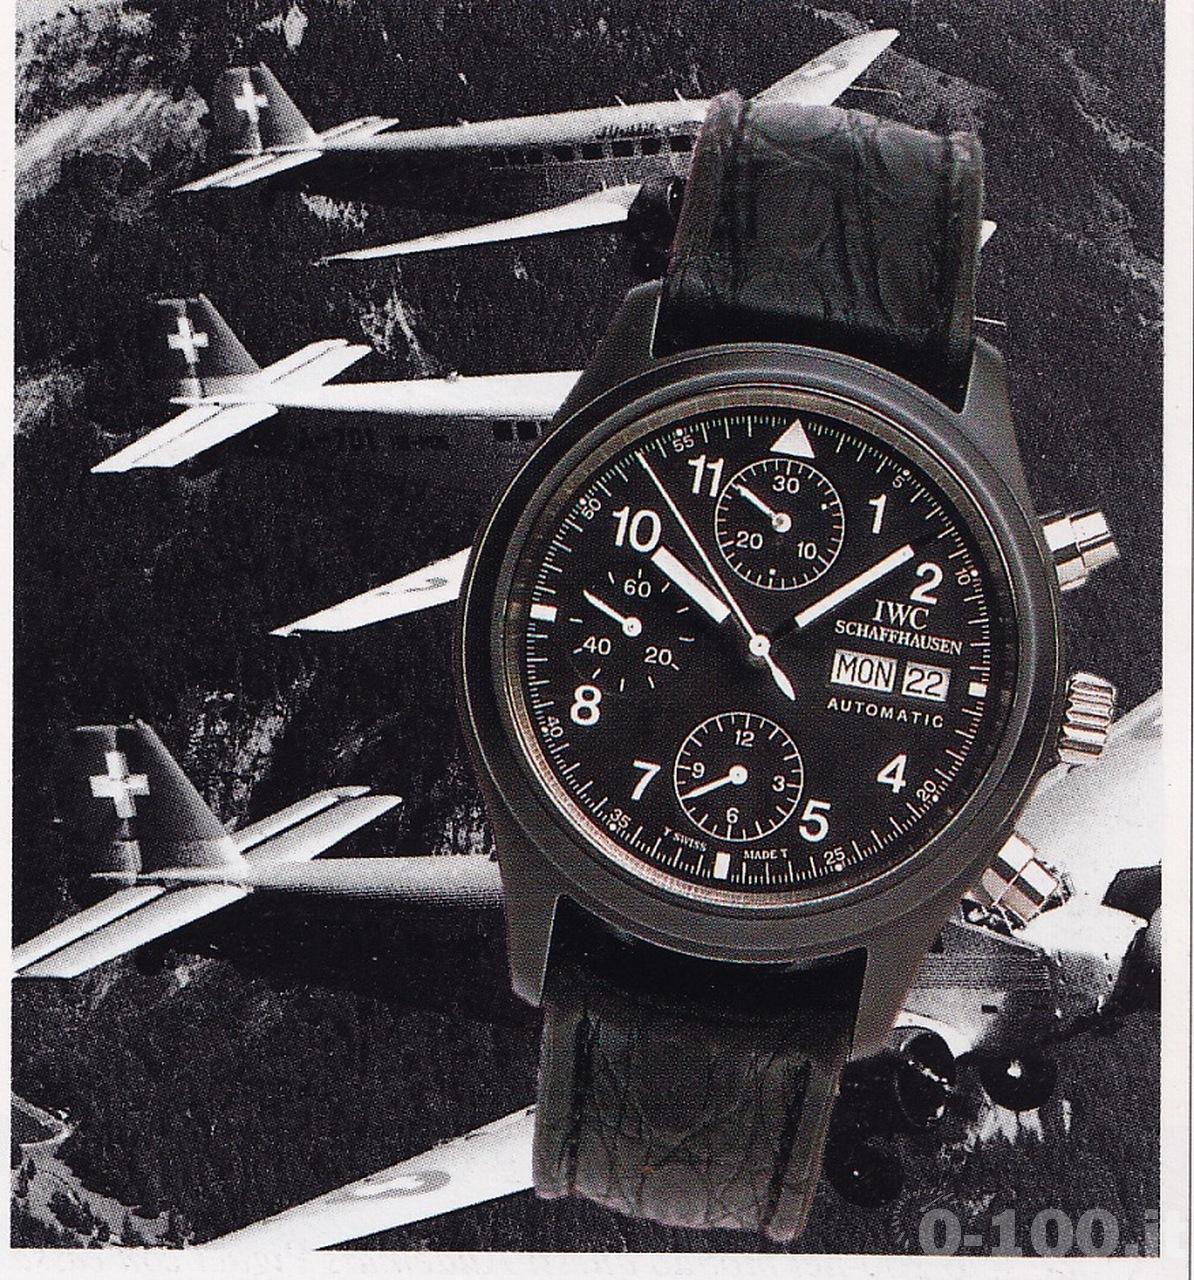 iwc-pilot-watch-chronograph_1994-0-100_2